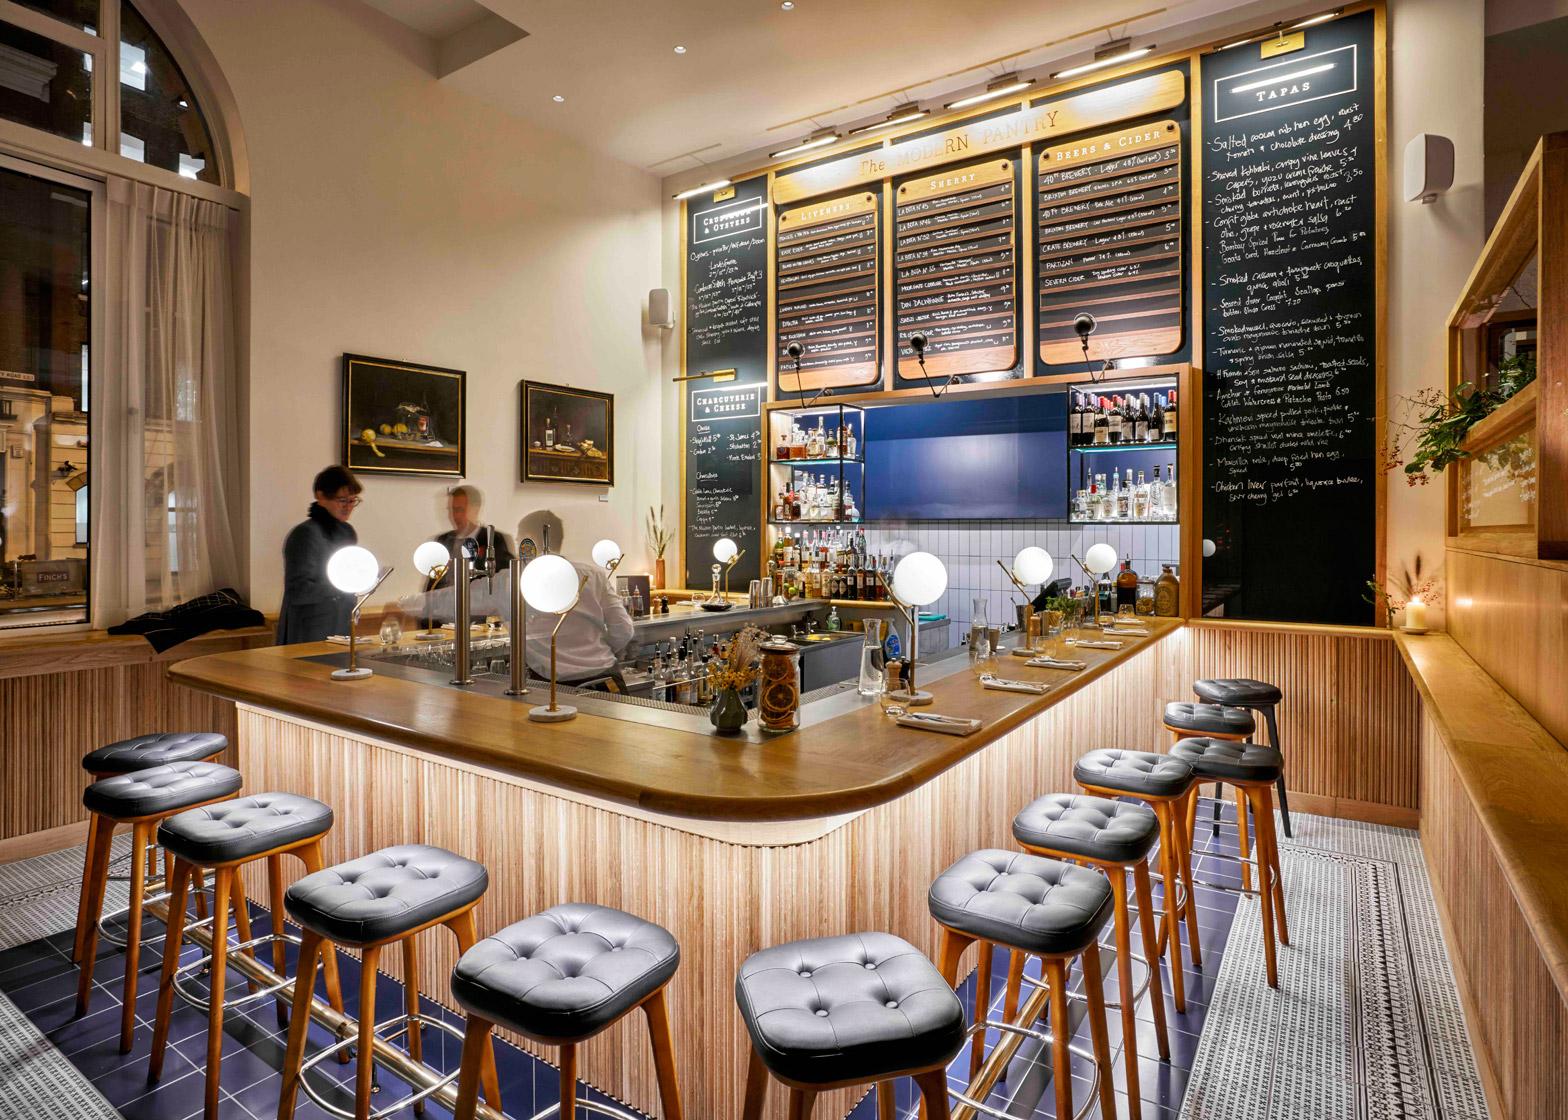 modern-pantry-avroko-restaurant-bar-interior-furniture-lighting-london-uk_dezeen_1568_11